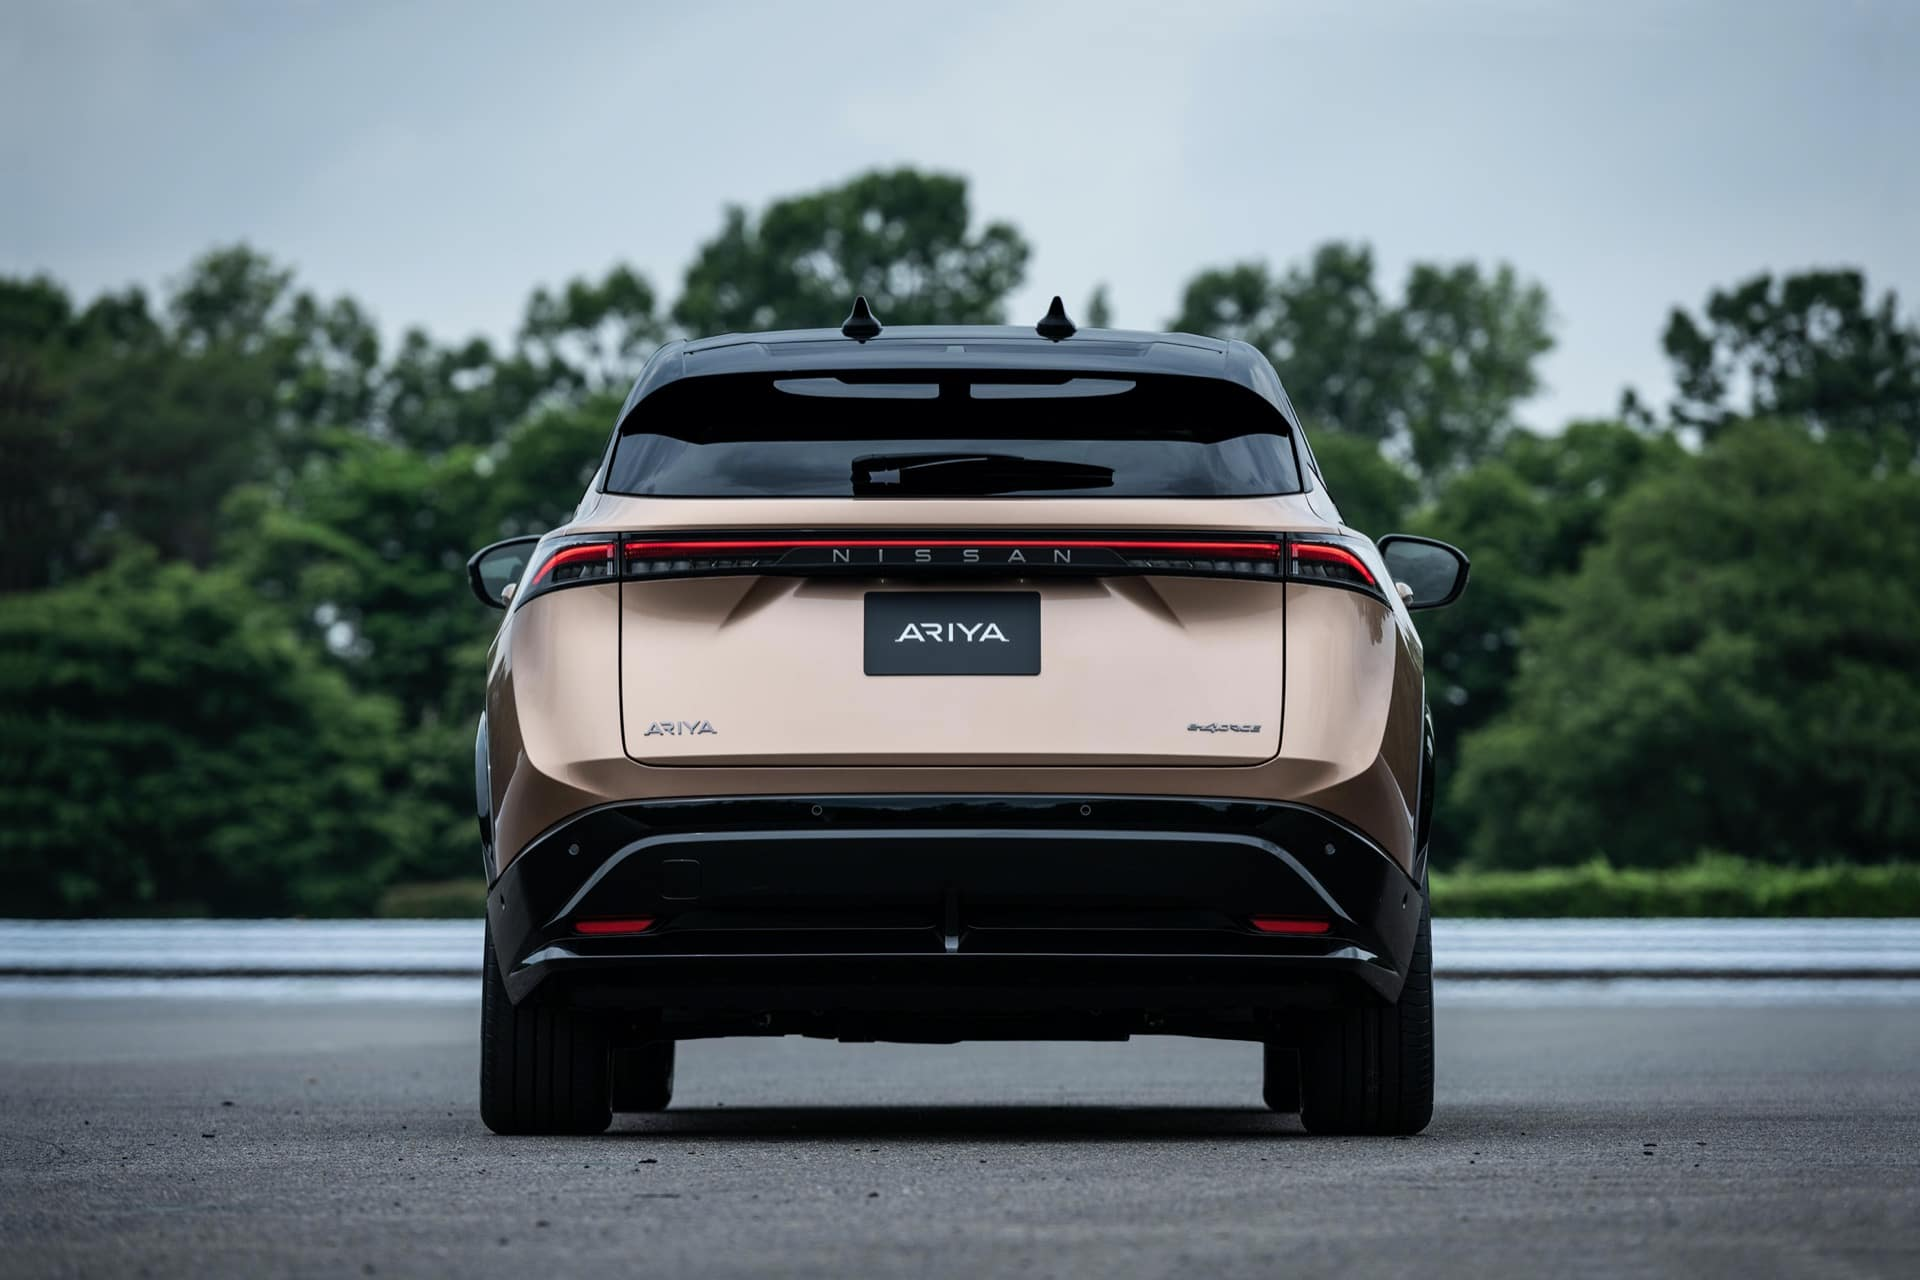 2022 Nissan Ariya Rear